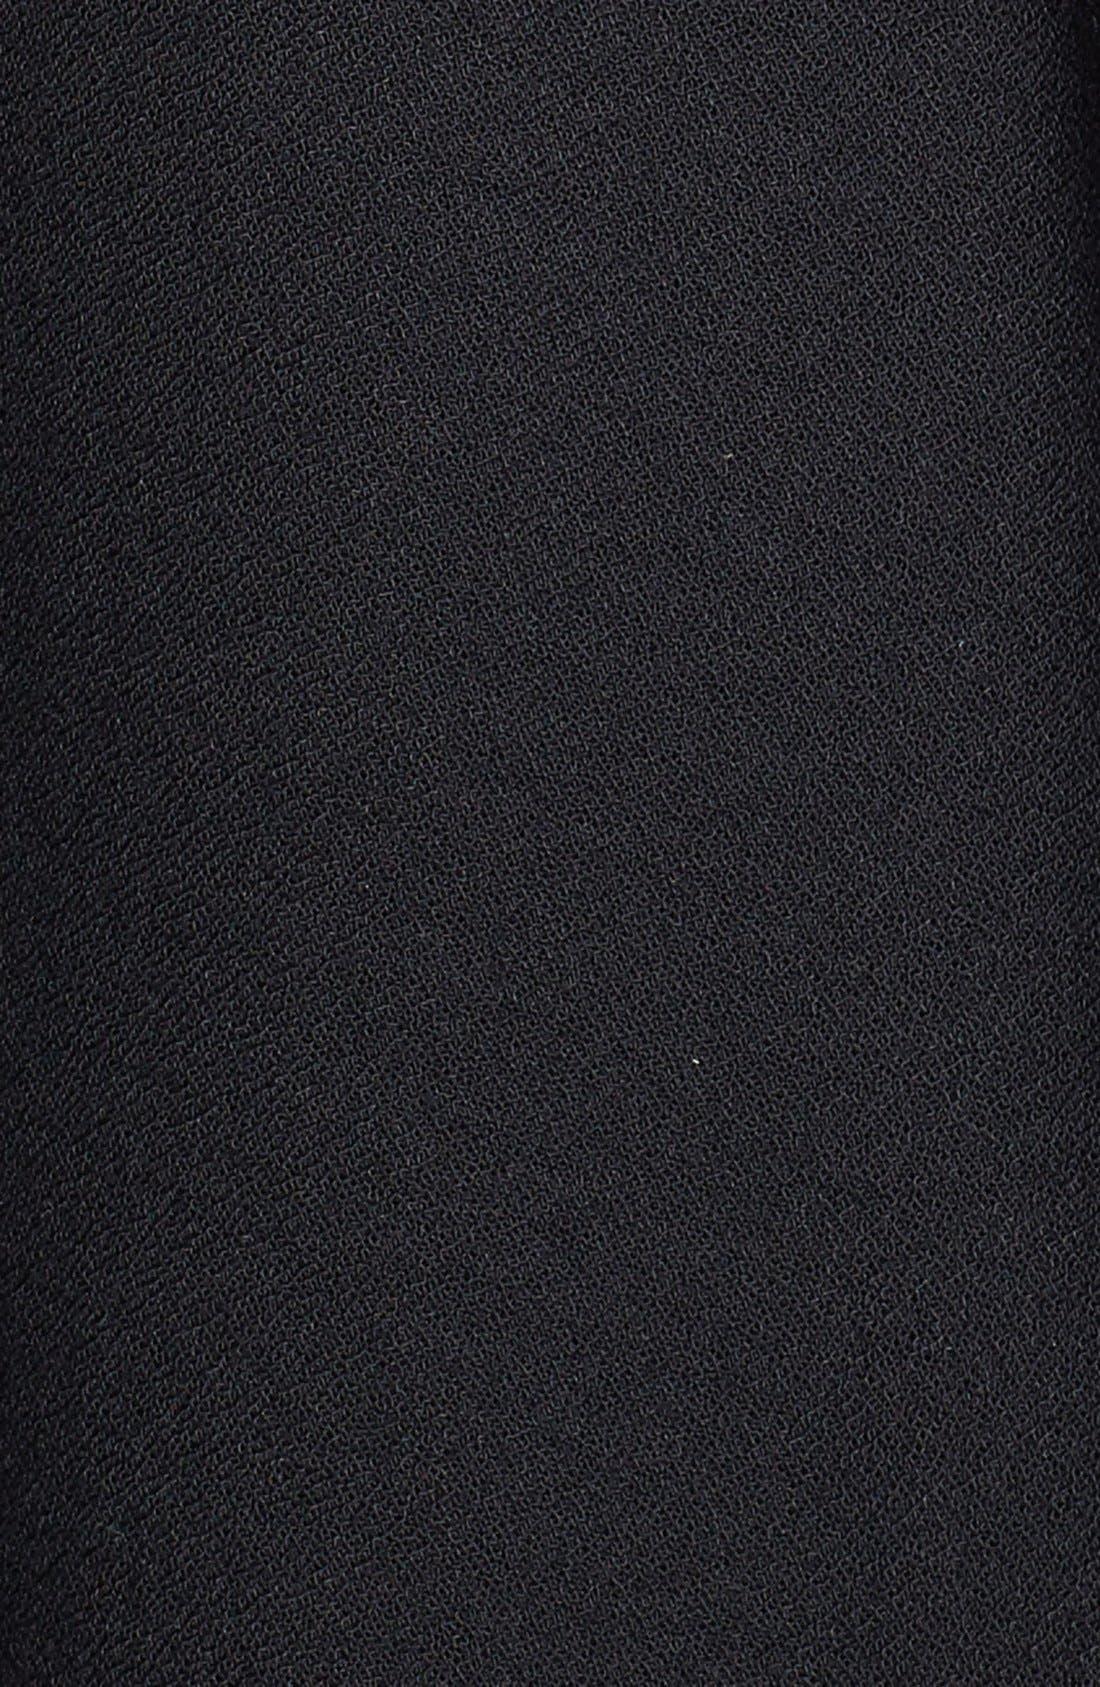 Alternate Image 3  - Ella Moss Drape Neck Top